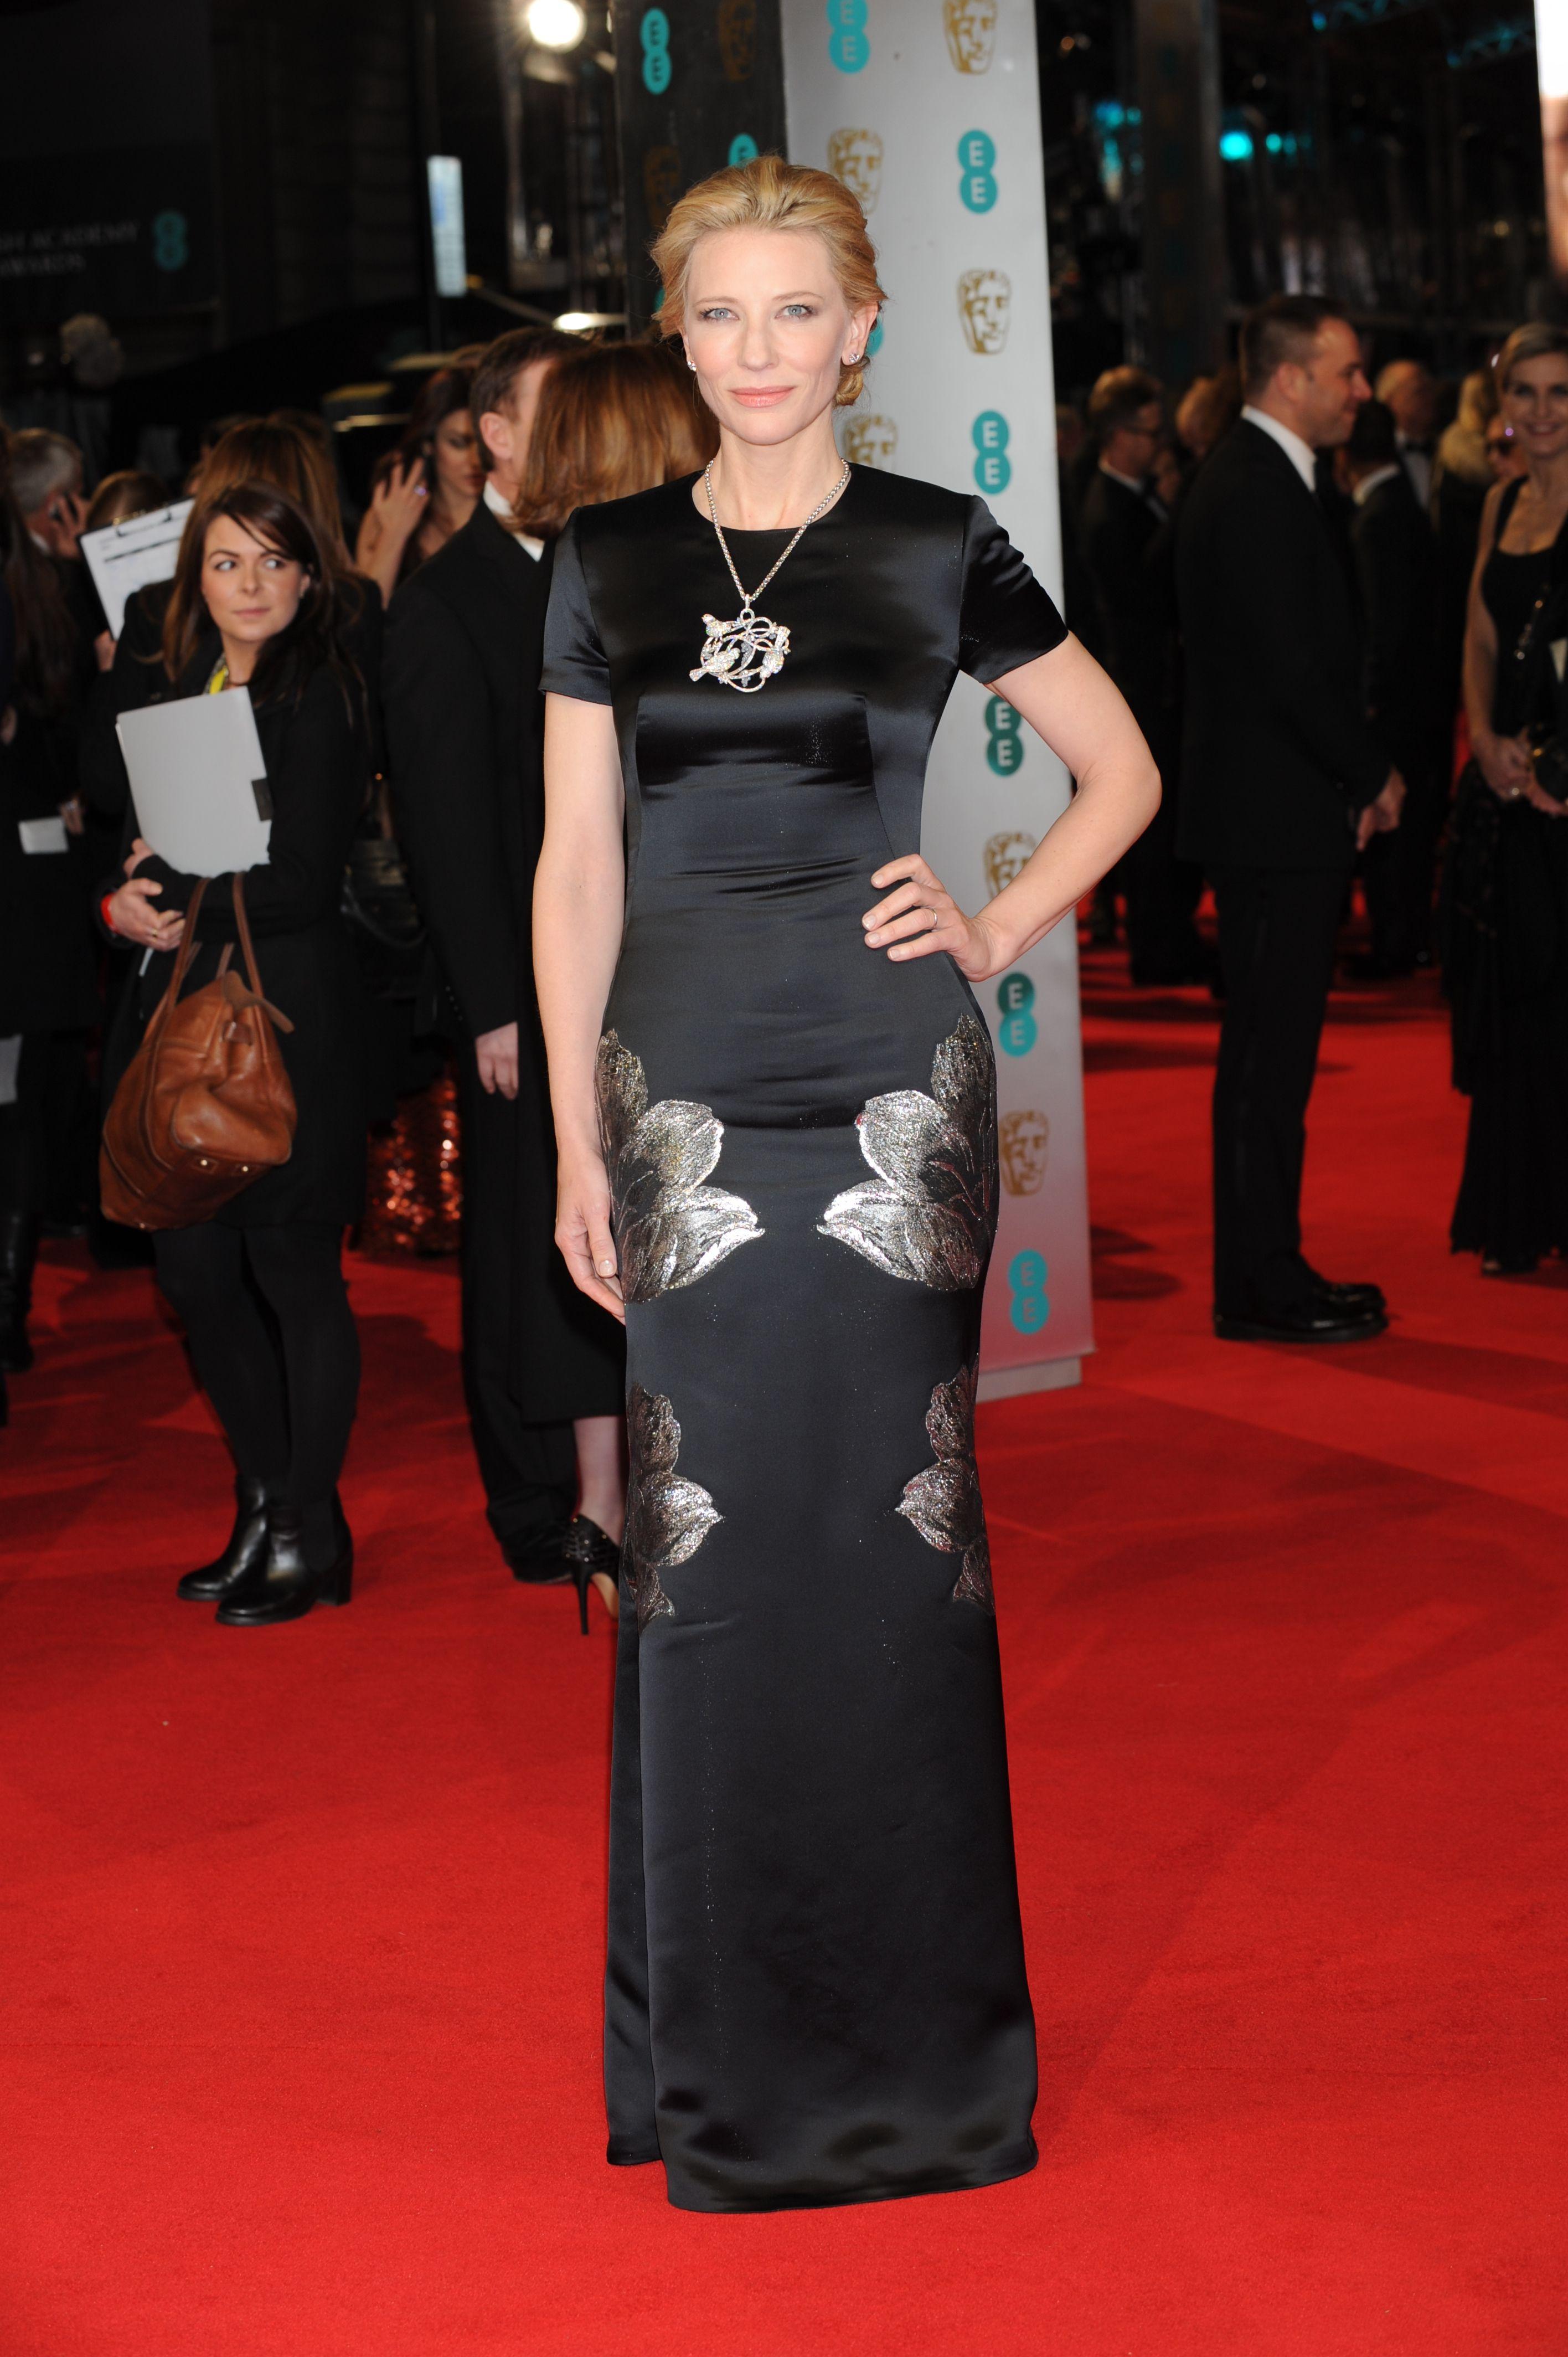 Cate Blanchett wearing Alexander McQueen to the BAFTAs